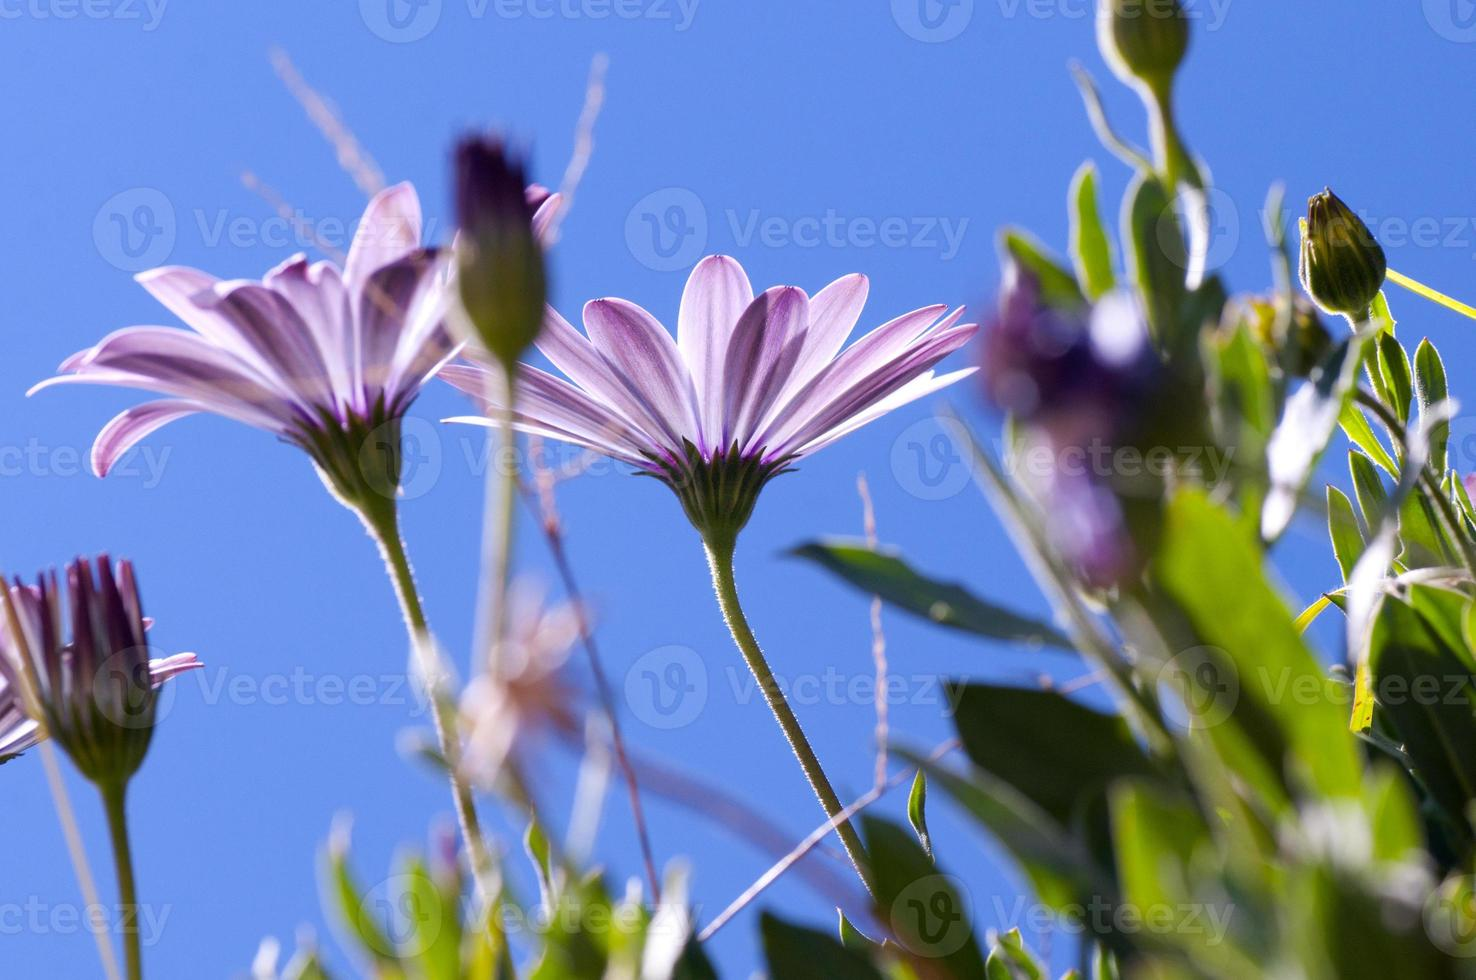 flor de colores sobre fondo de cielo azul foto